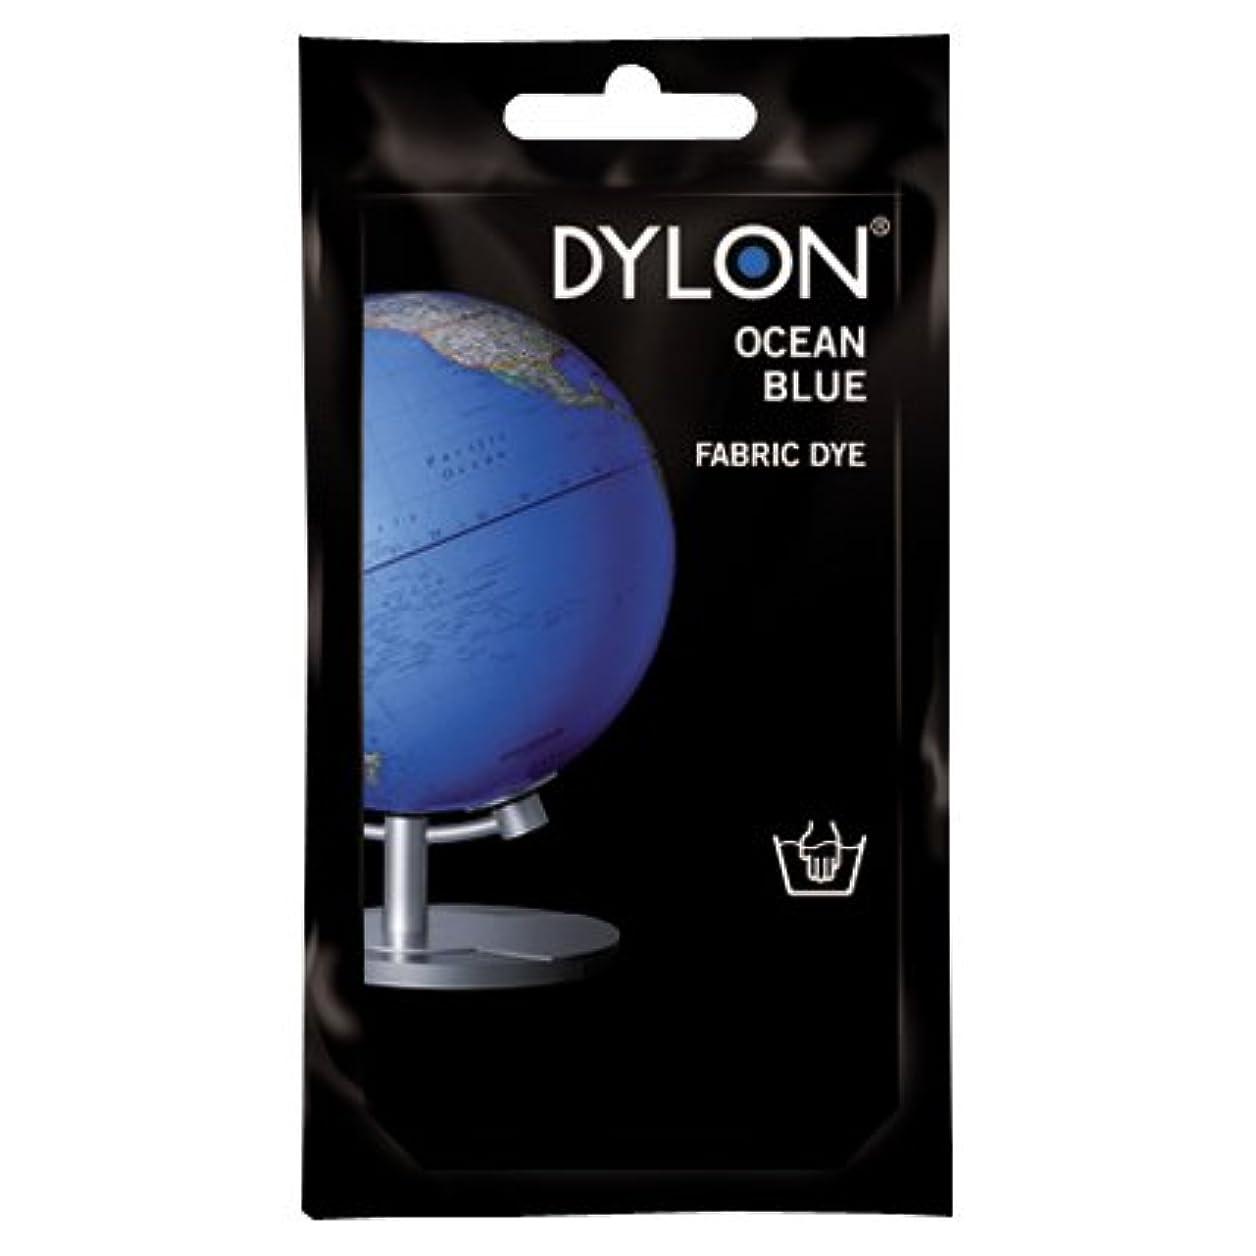 放課後無人荒れ地DYLON Ocean Blue Hand Dye 50g by Dylon